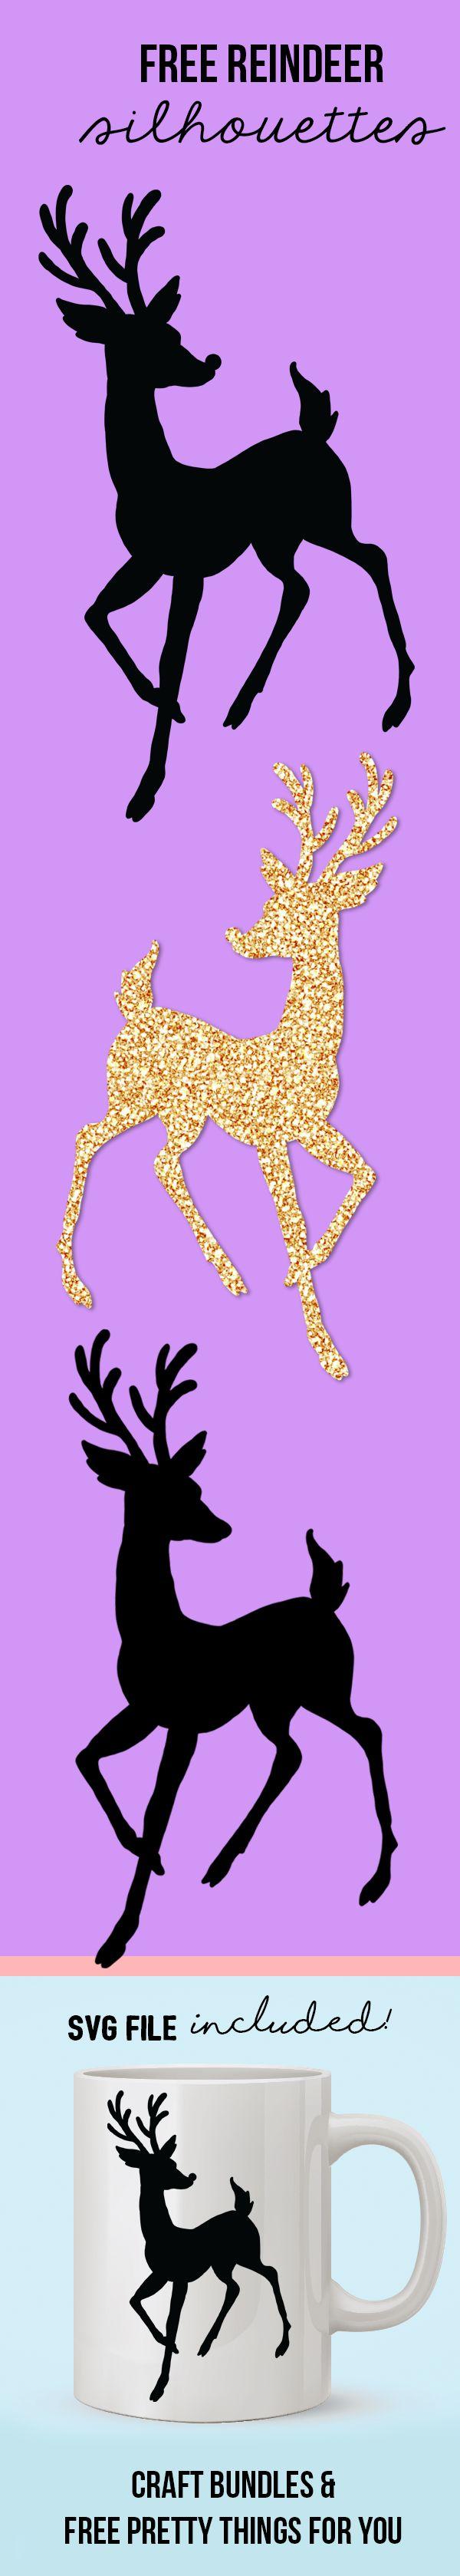 best 25 reindeer silhouette ideas on pinterest santa sleigh